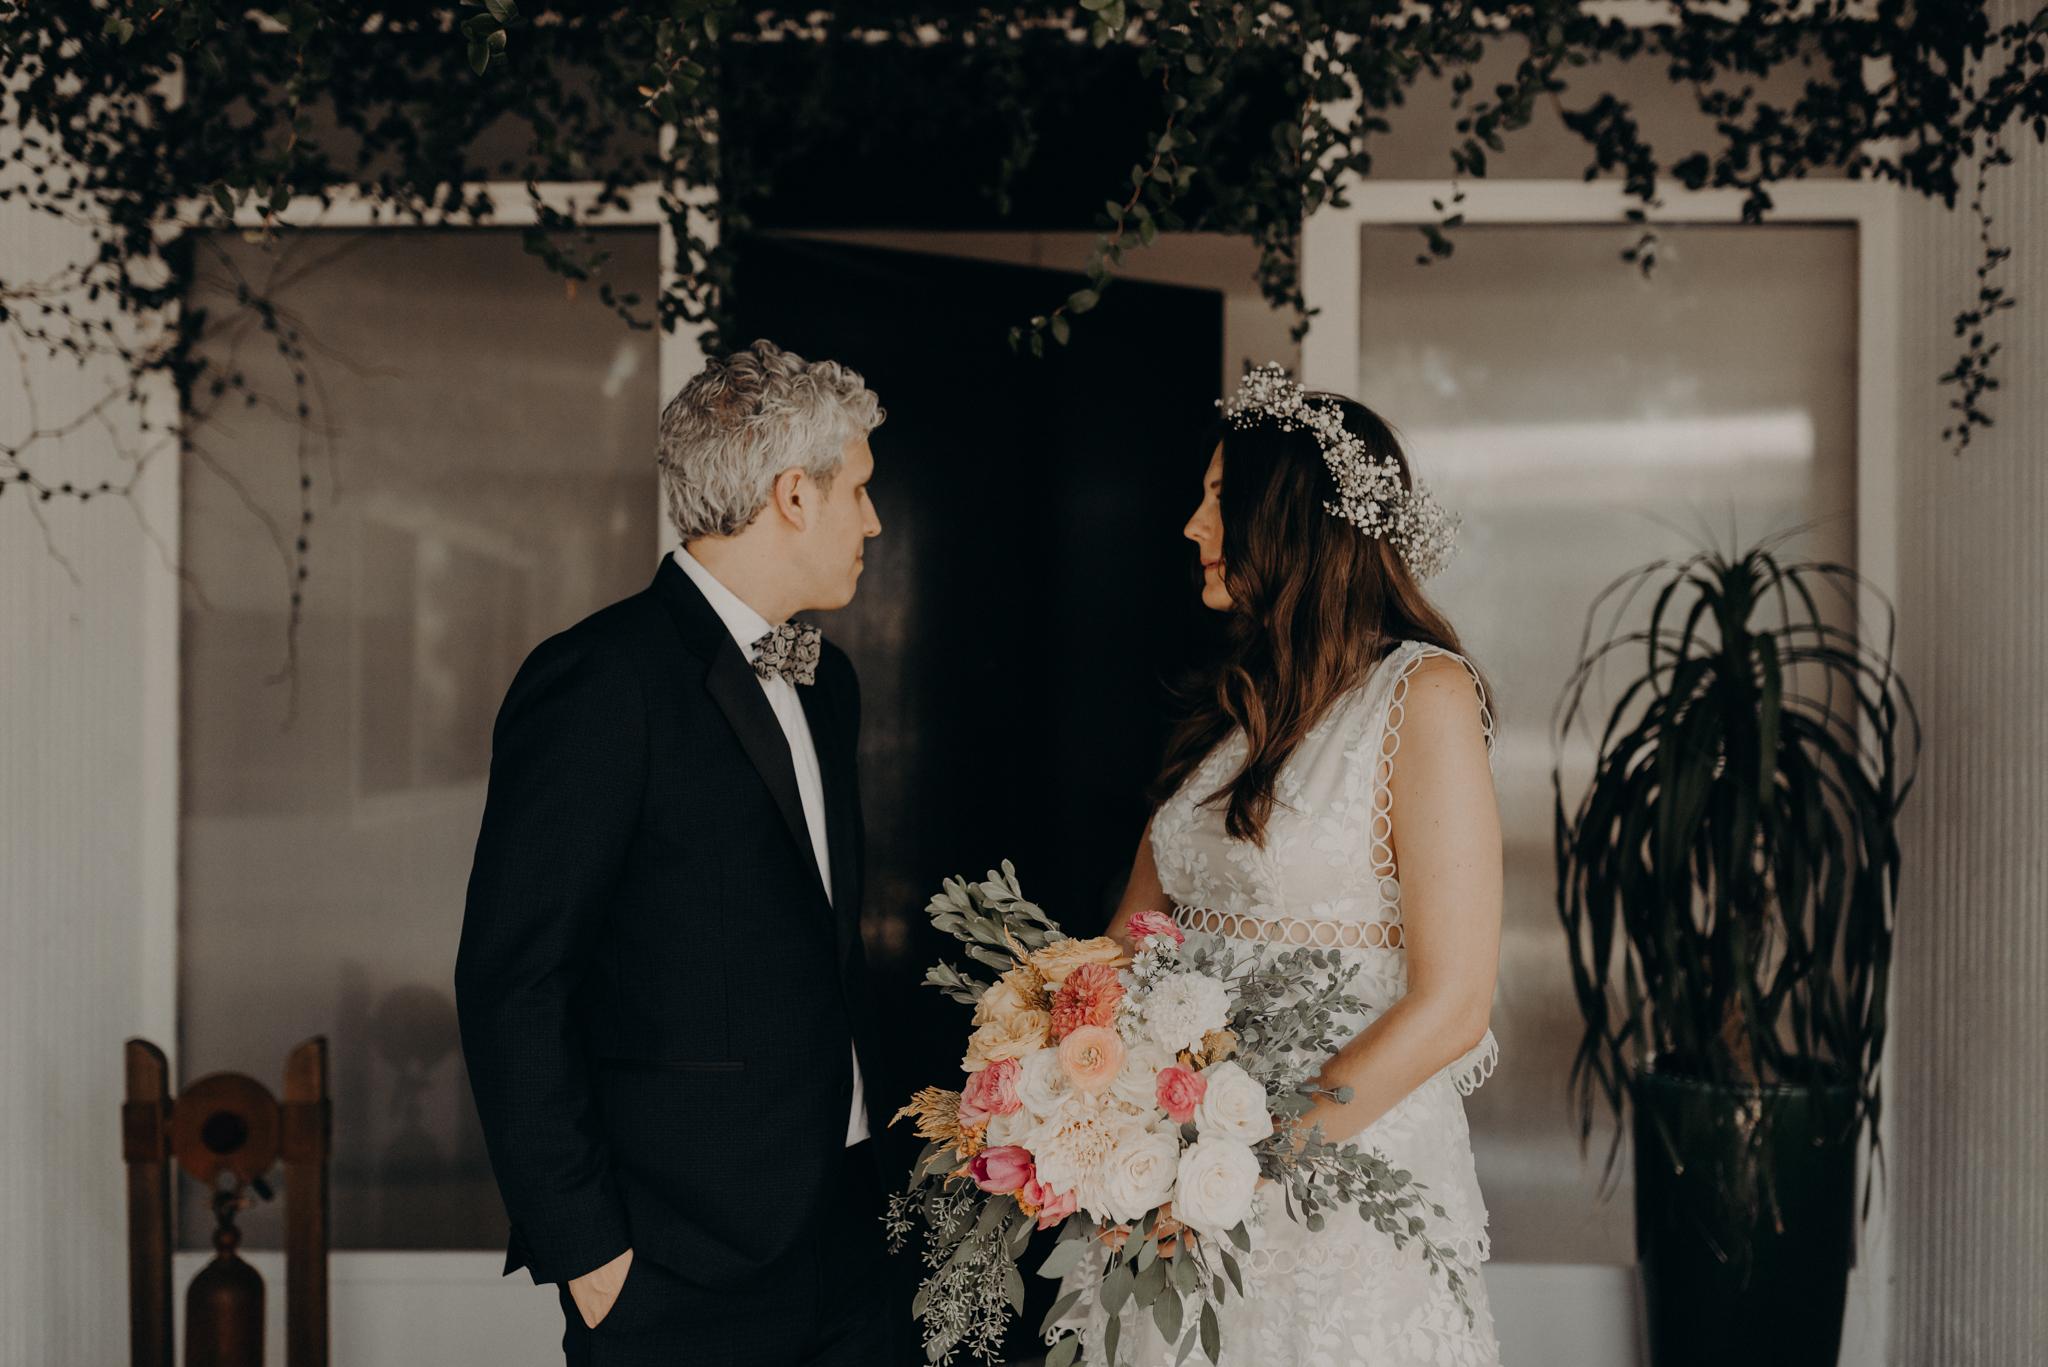 Isaiah + Taylor Photography - Private Estate Backyard Wedding - Beverly Hills - Los Angeles Wedding Photographer - 17.jpg